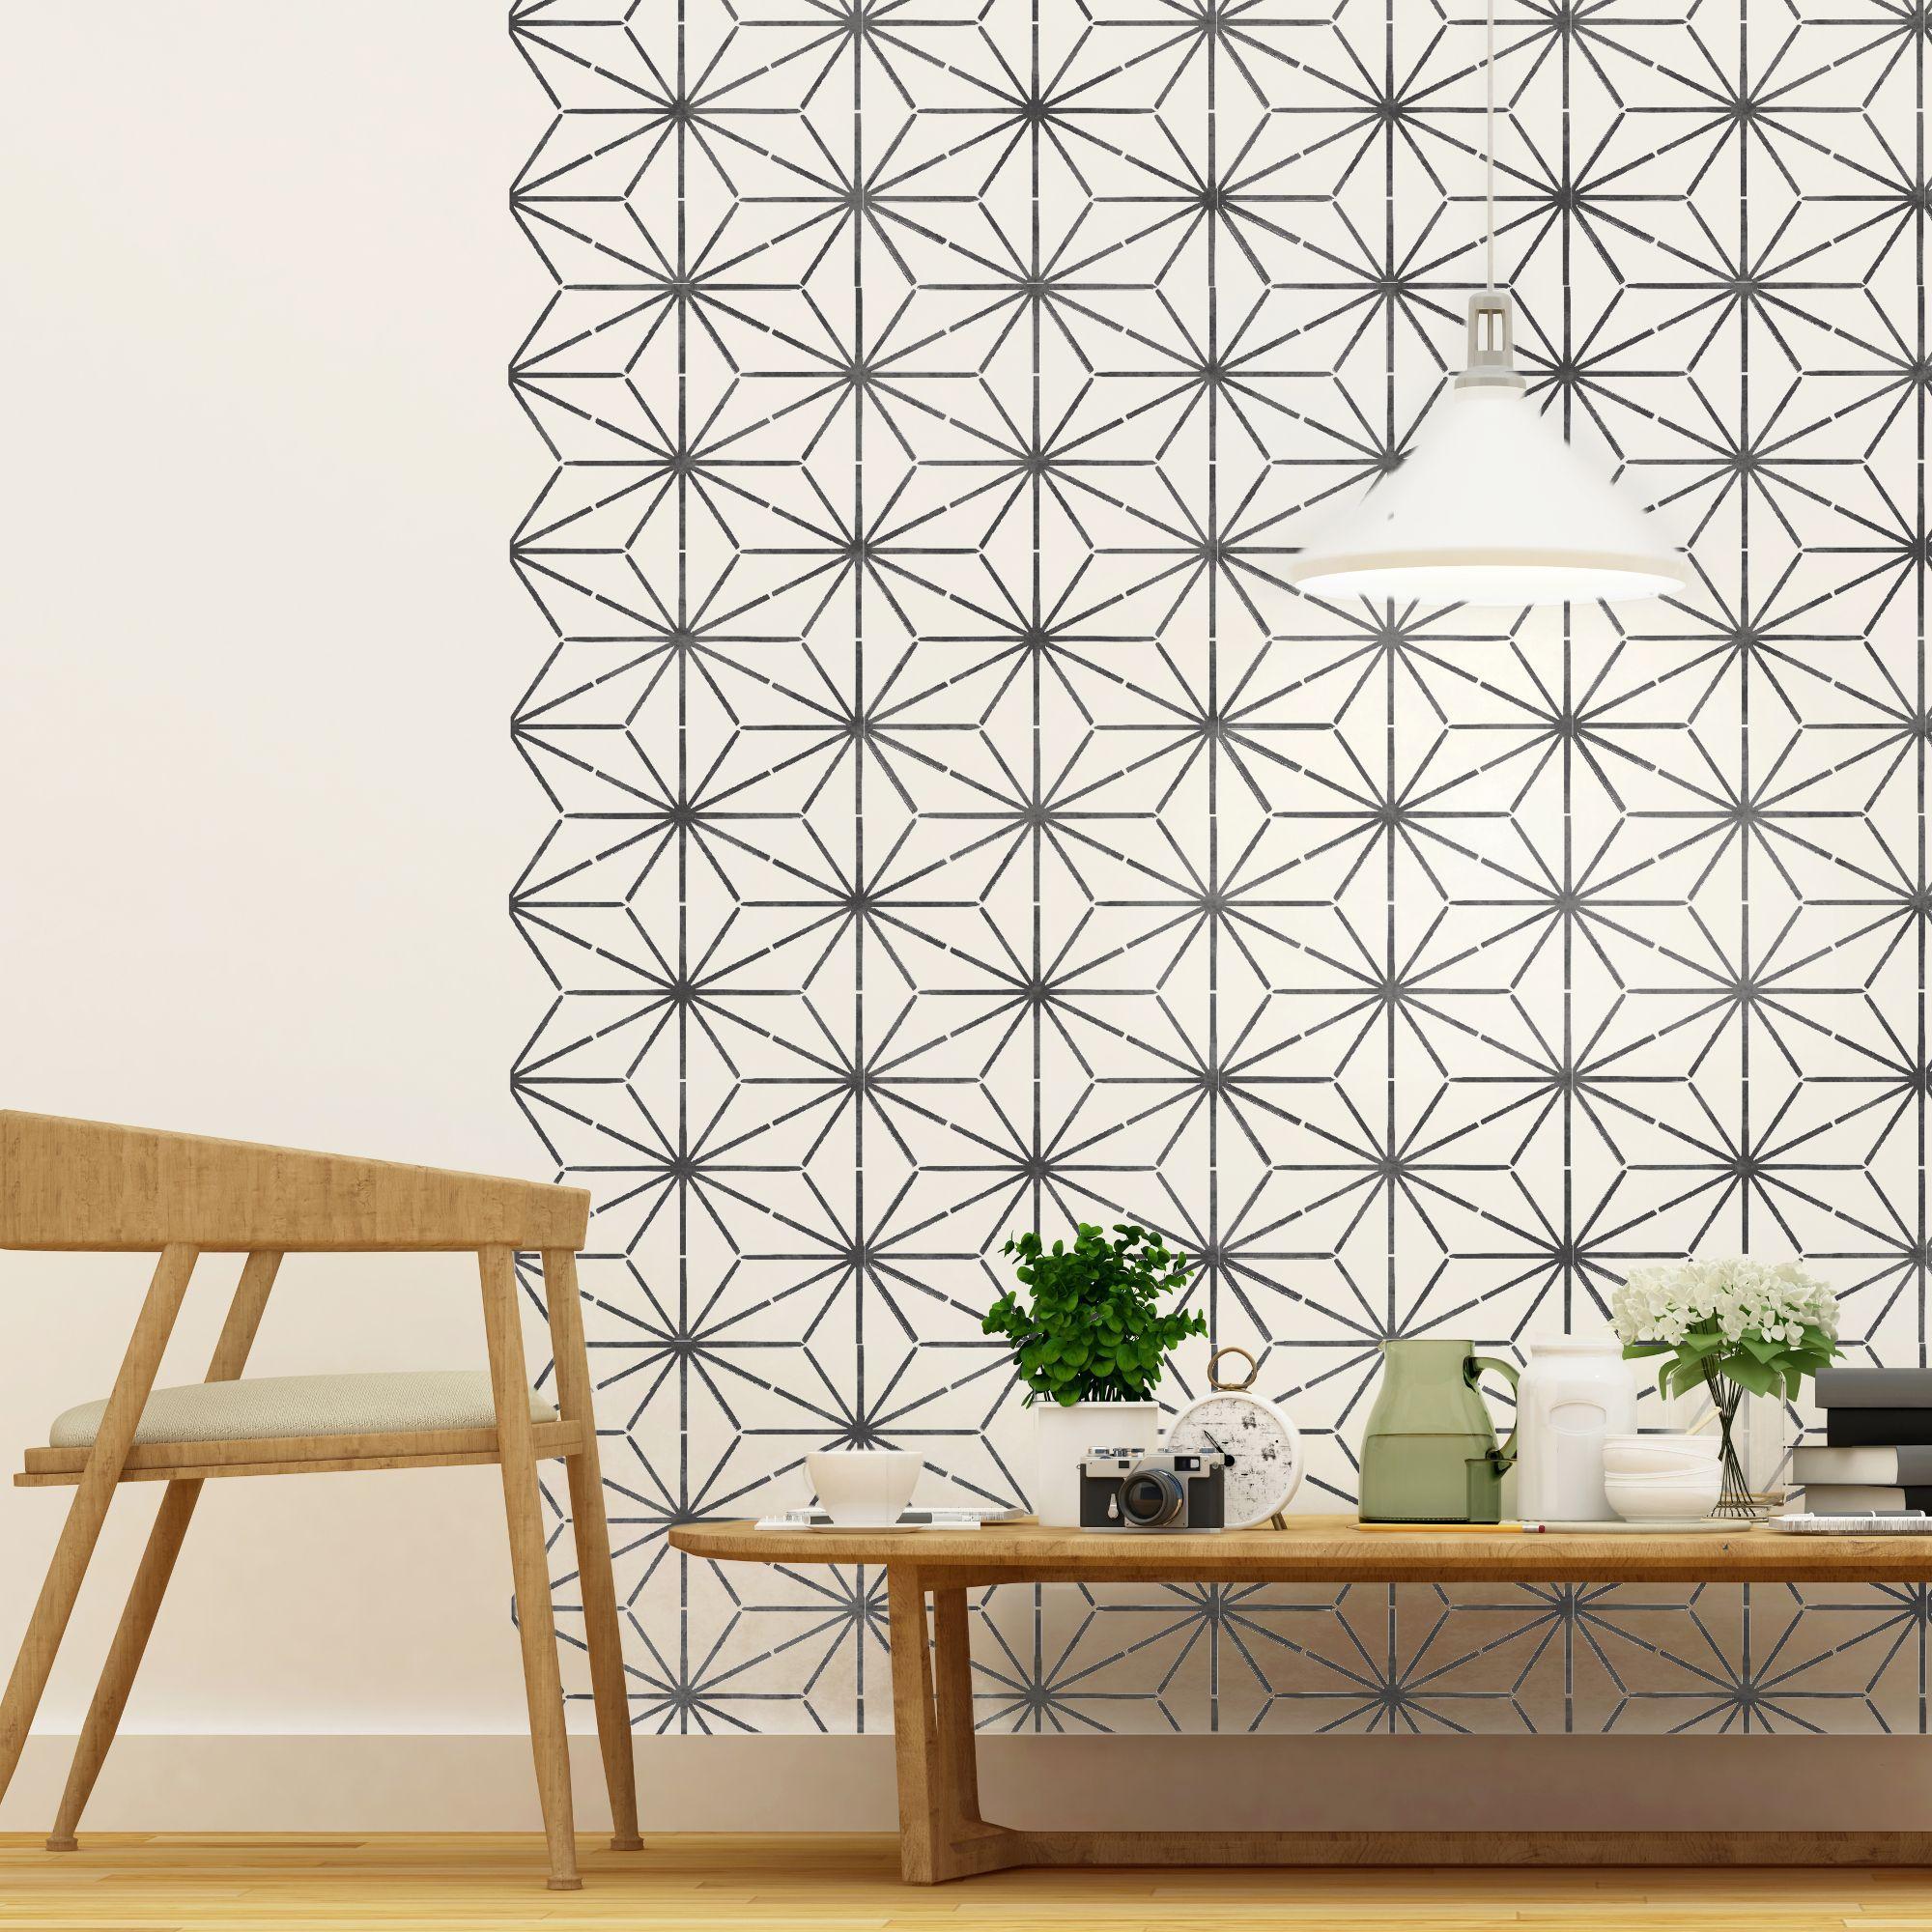 Image Result For Geometric Stencils Stencil Furniture Geometric Stencil Stenciled Floor